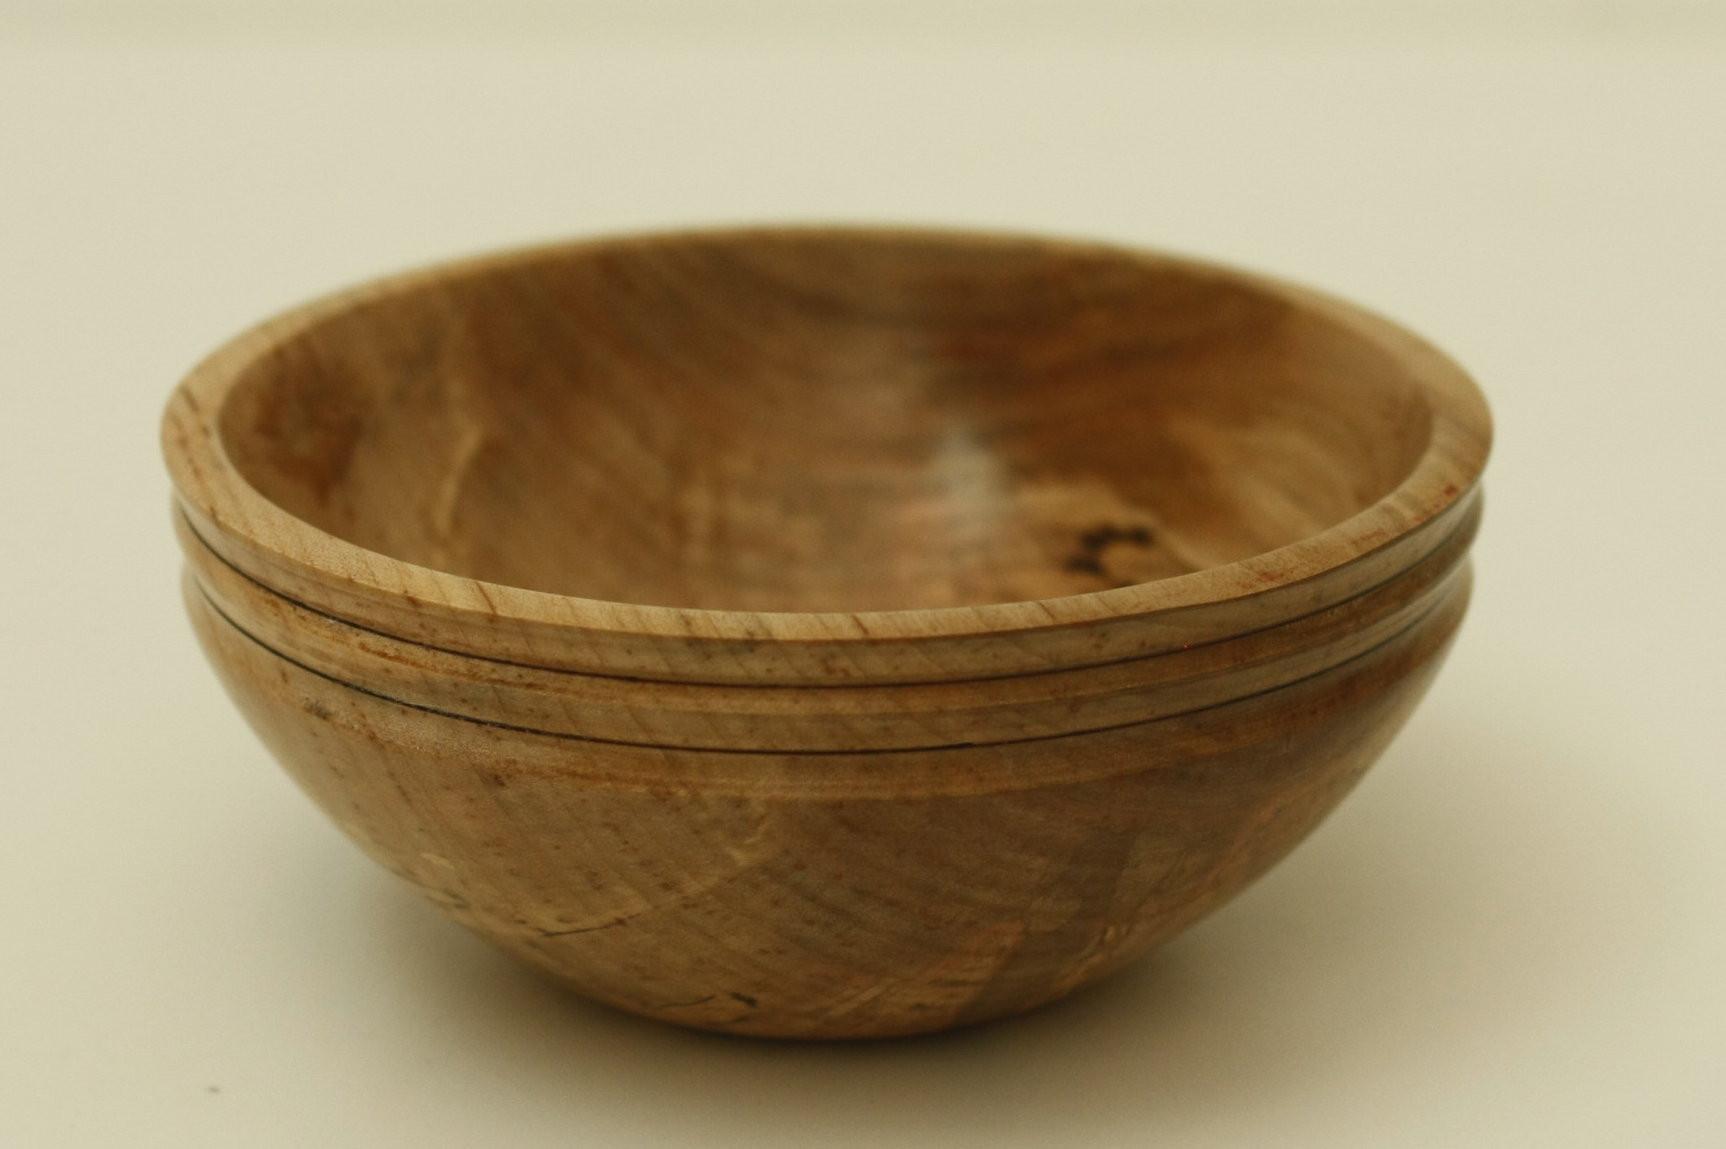 Beaded ash bowl